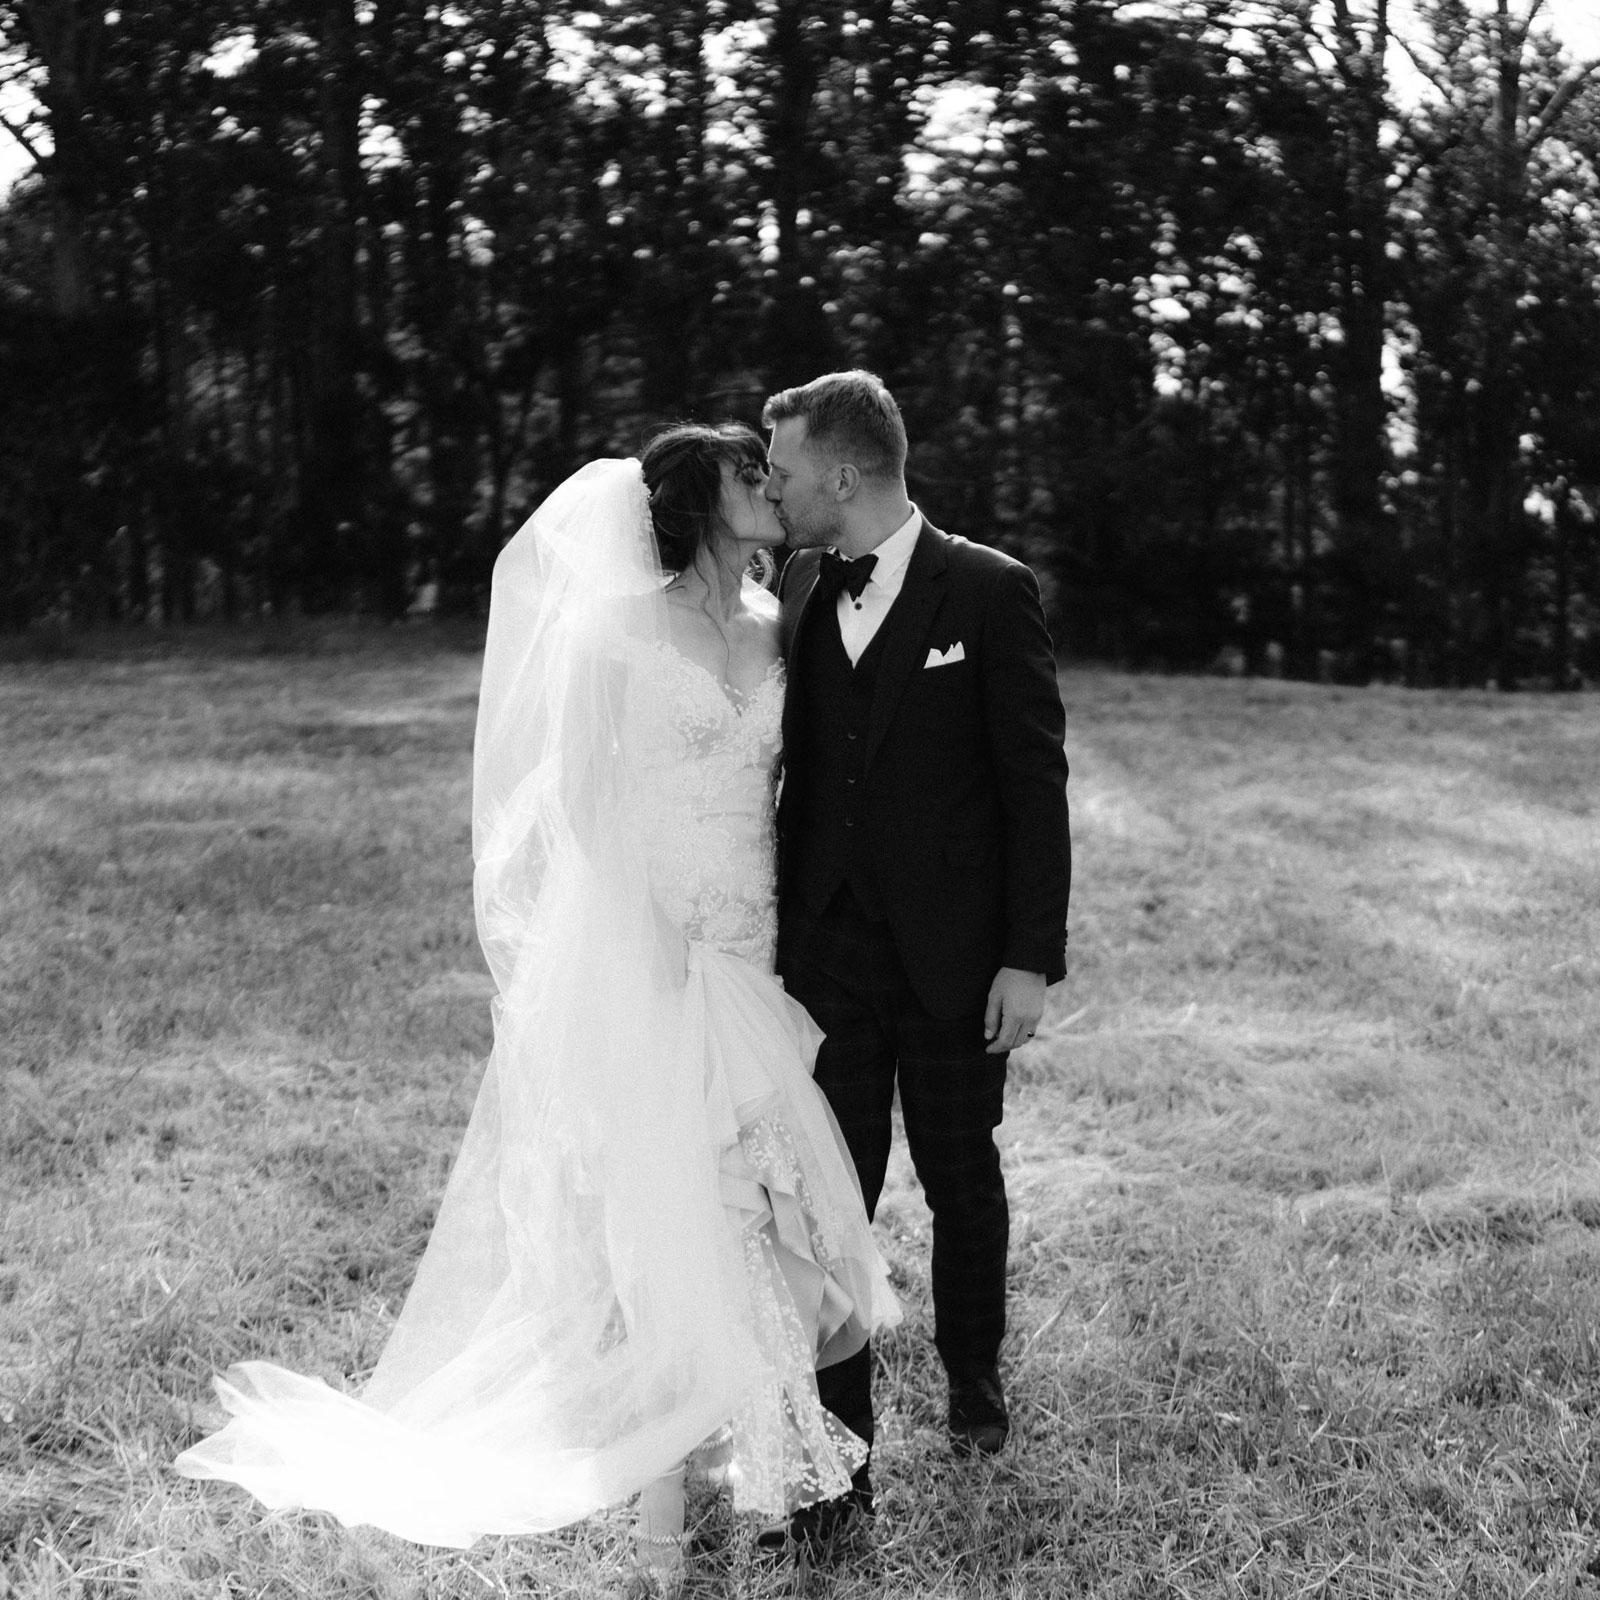 newfound-n-c-olive-tree-cottage-tauranga-wedding-photographer-840A